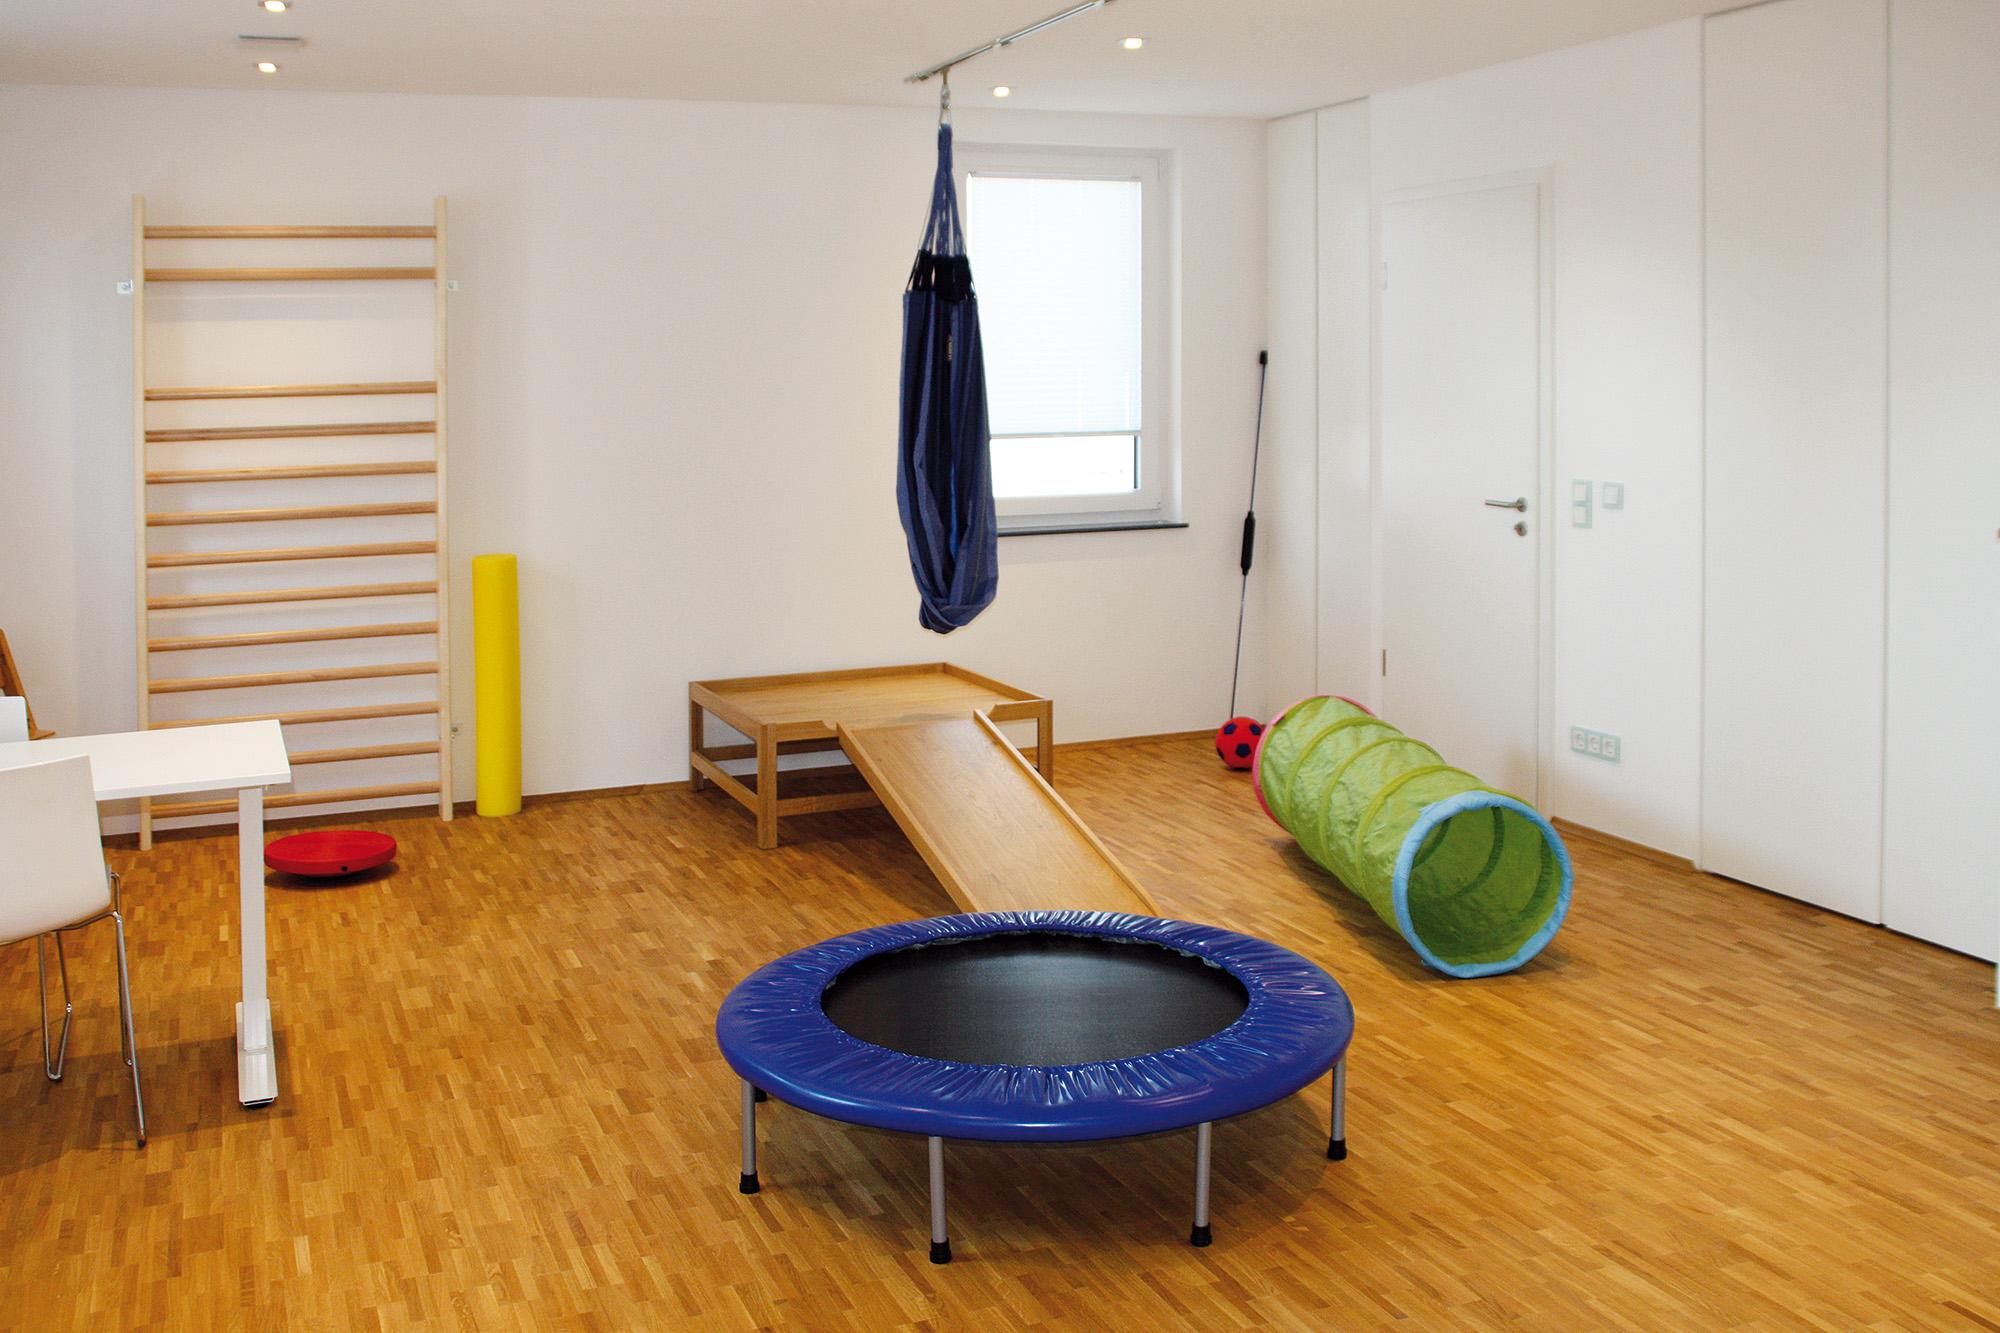 ergovitalis-ergotherapie-crailsheim-praxis-behandlungsraum01-2017